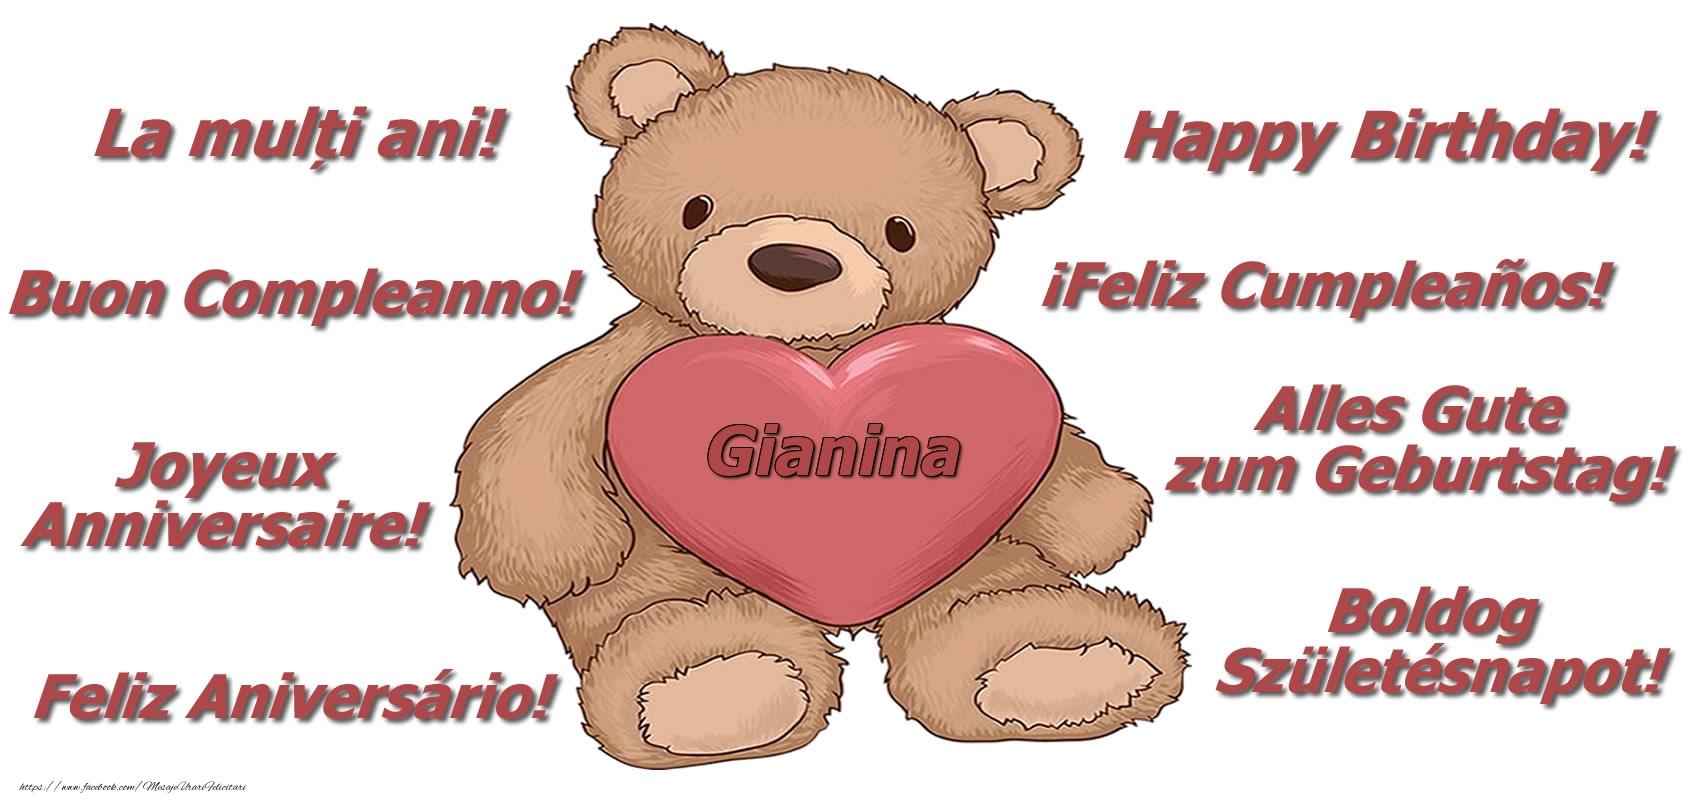 Felicitari de zi de nastere - La multi ani Gianina! - Ursulet